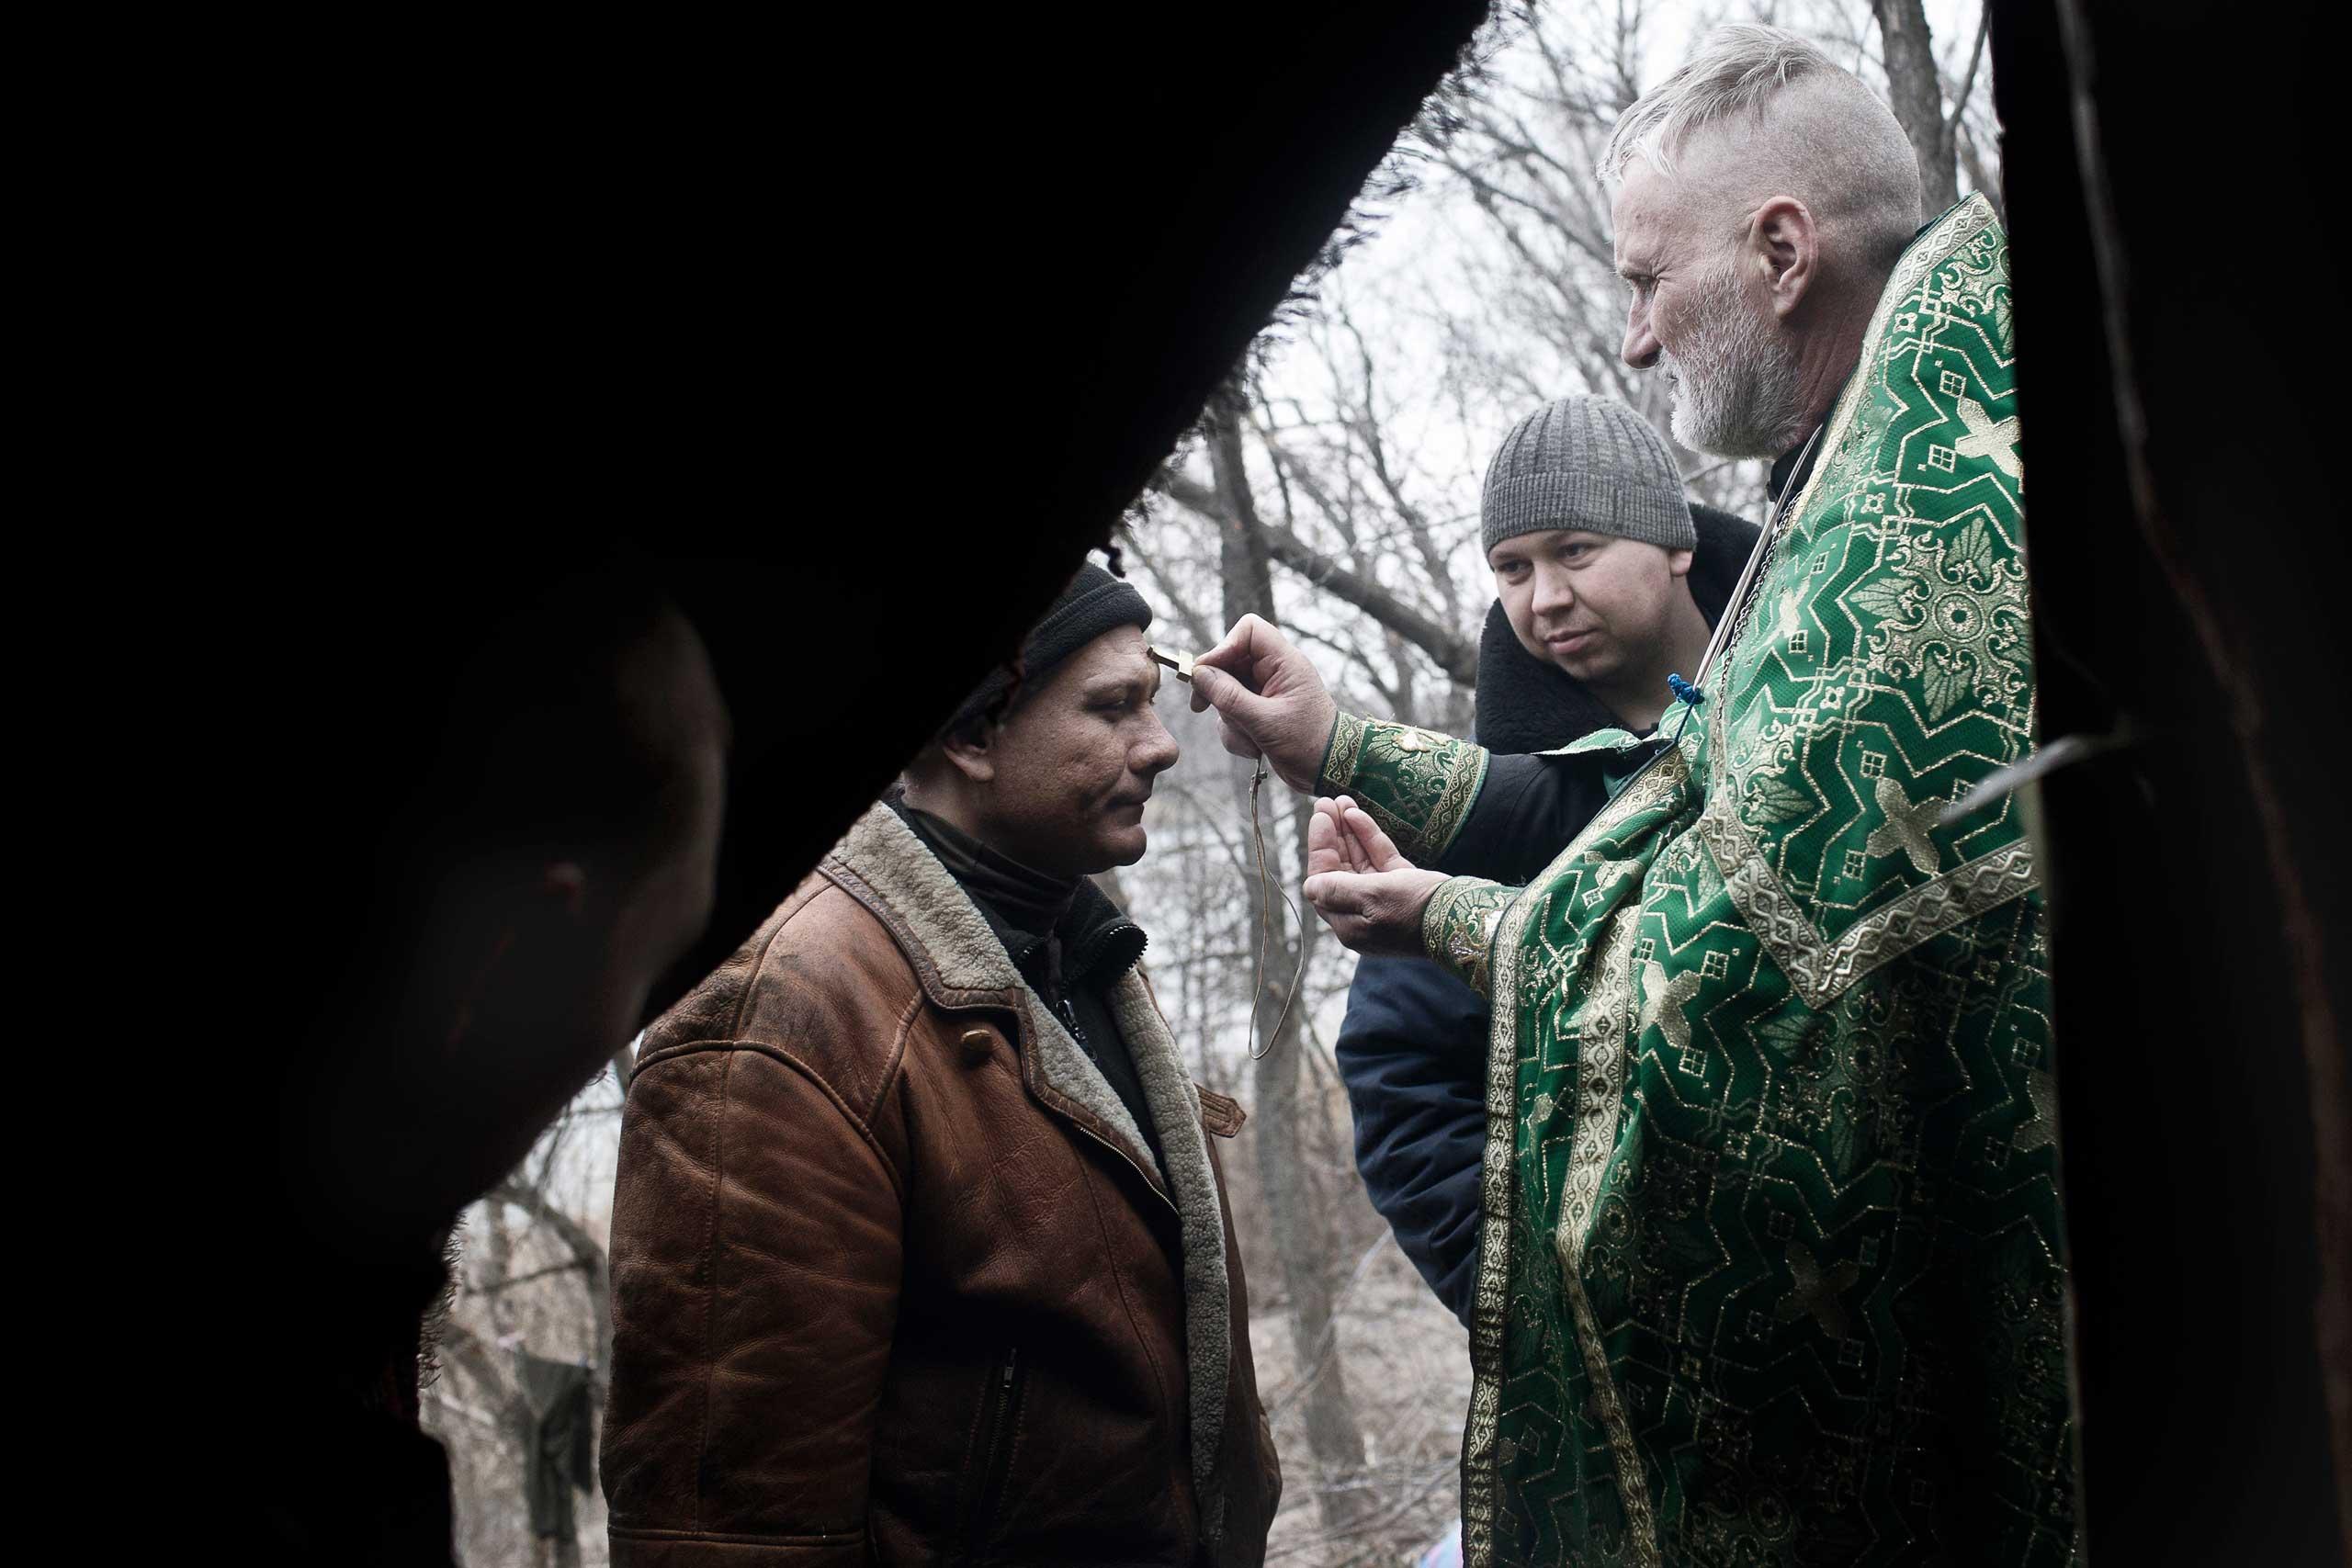 A Ukrainian Orthodox priest ministers to a volunteer member of the Aidar Battalion, a volunteer group fighting against Russian separatists in Shastya in the restive region of Luhansk, eastern Ukraine, Feb. 8, 2015.